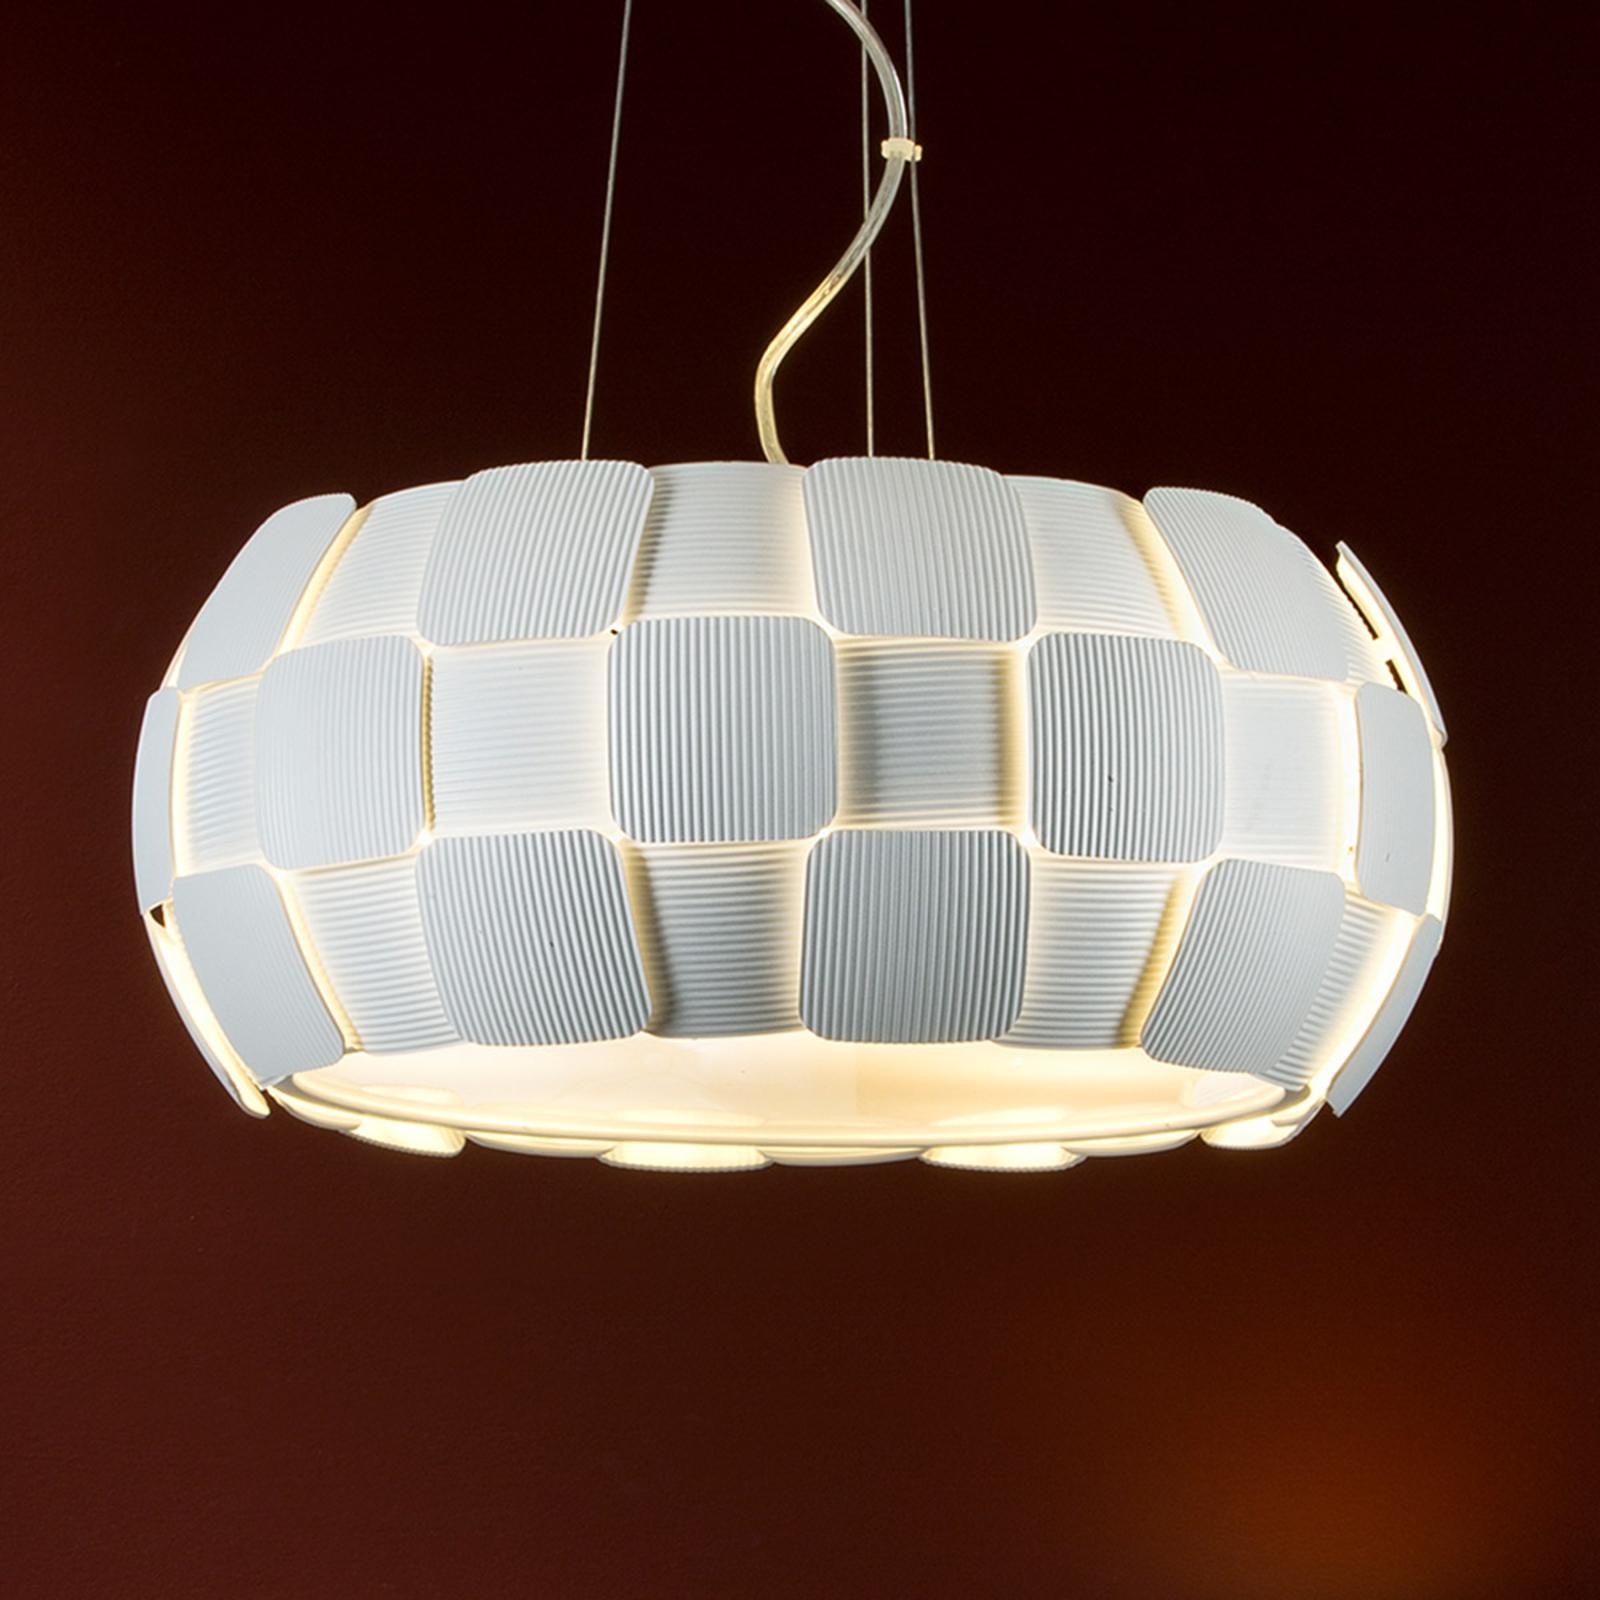 Witte hanglamp Quios met grote kap